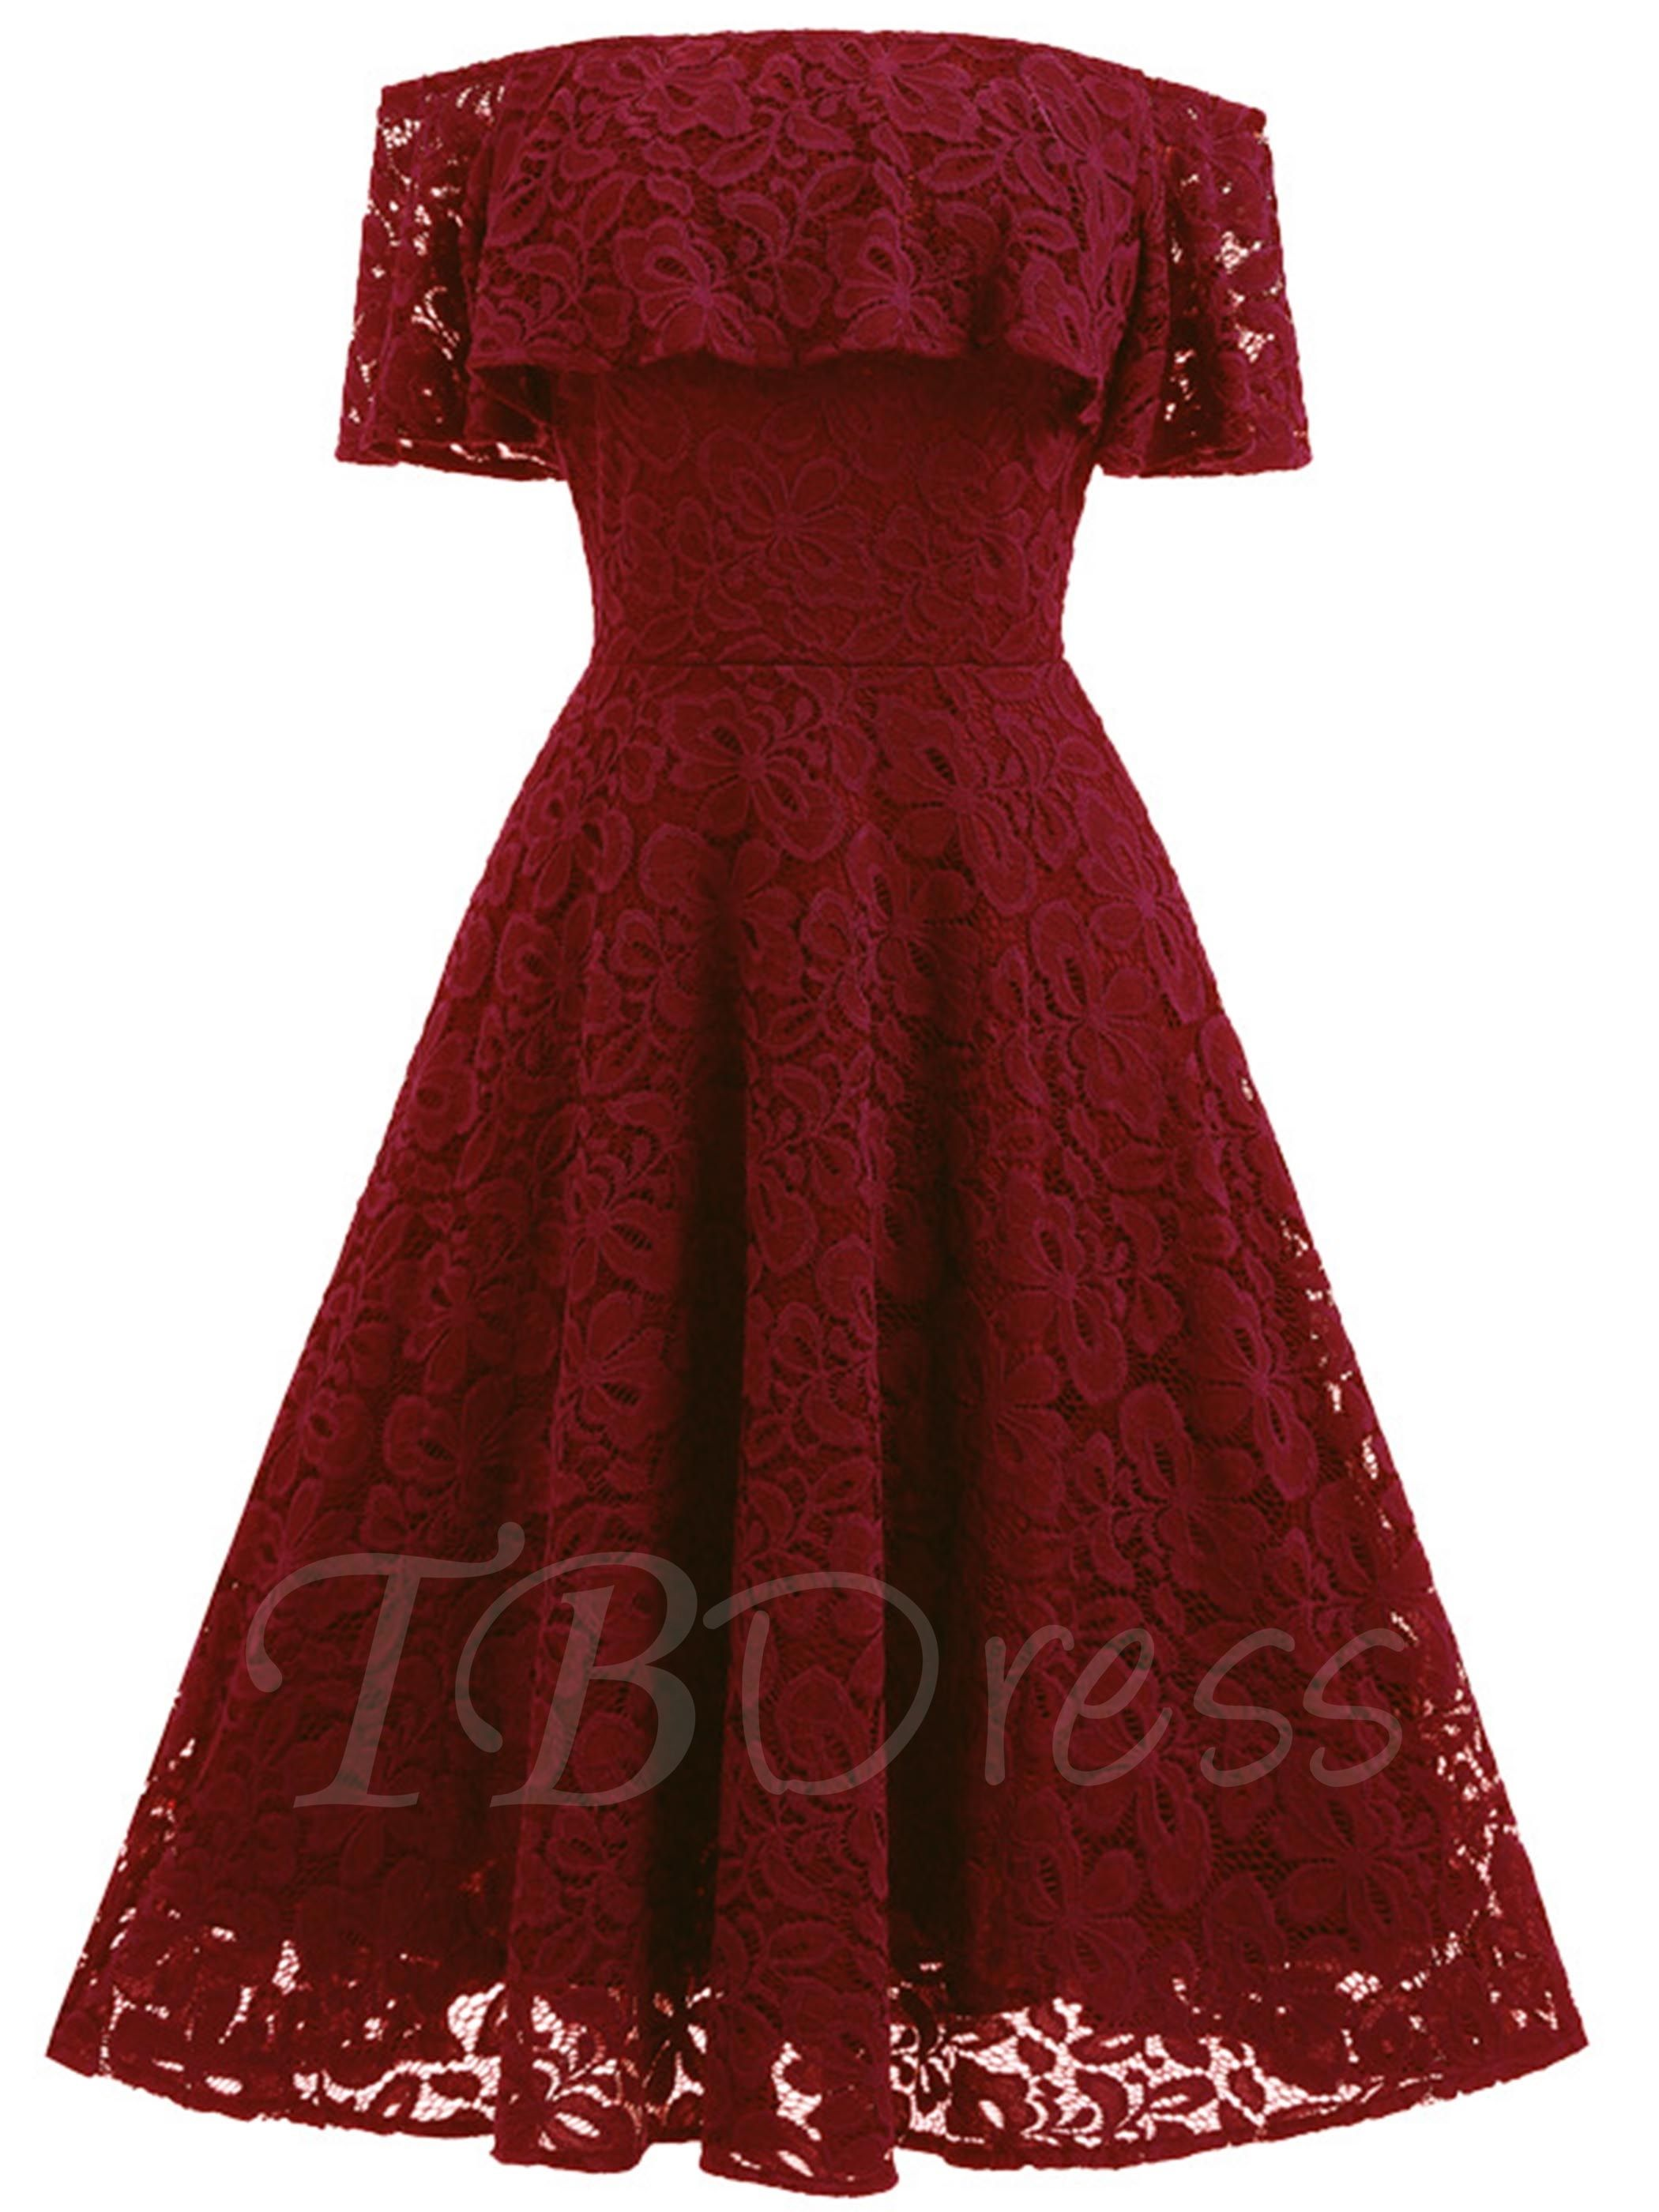 Unit Dresses